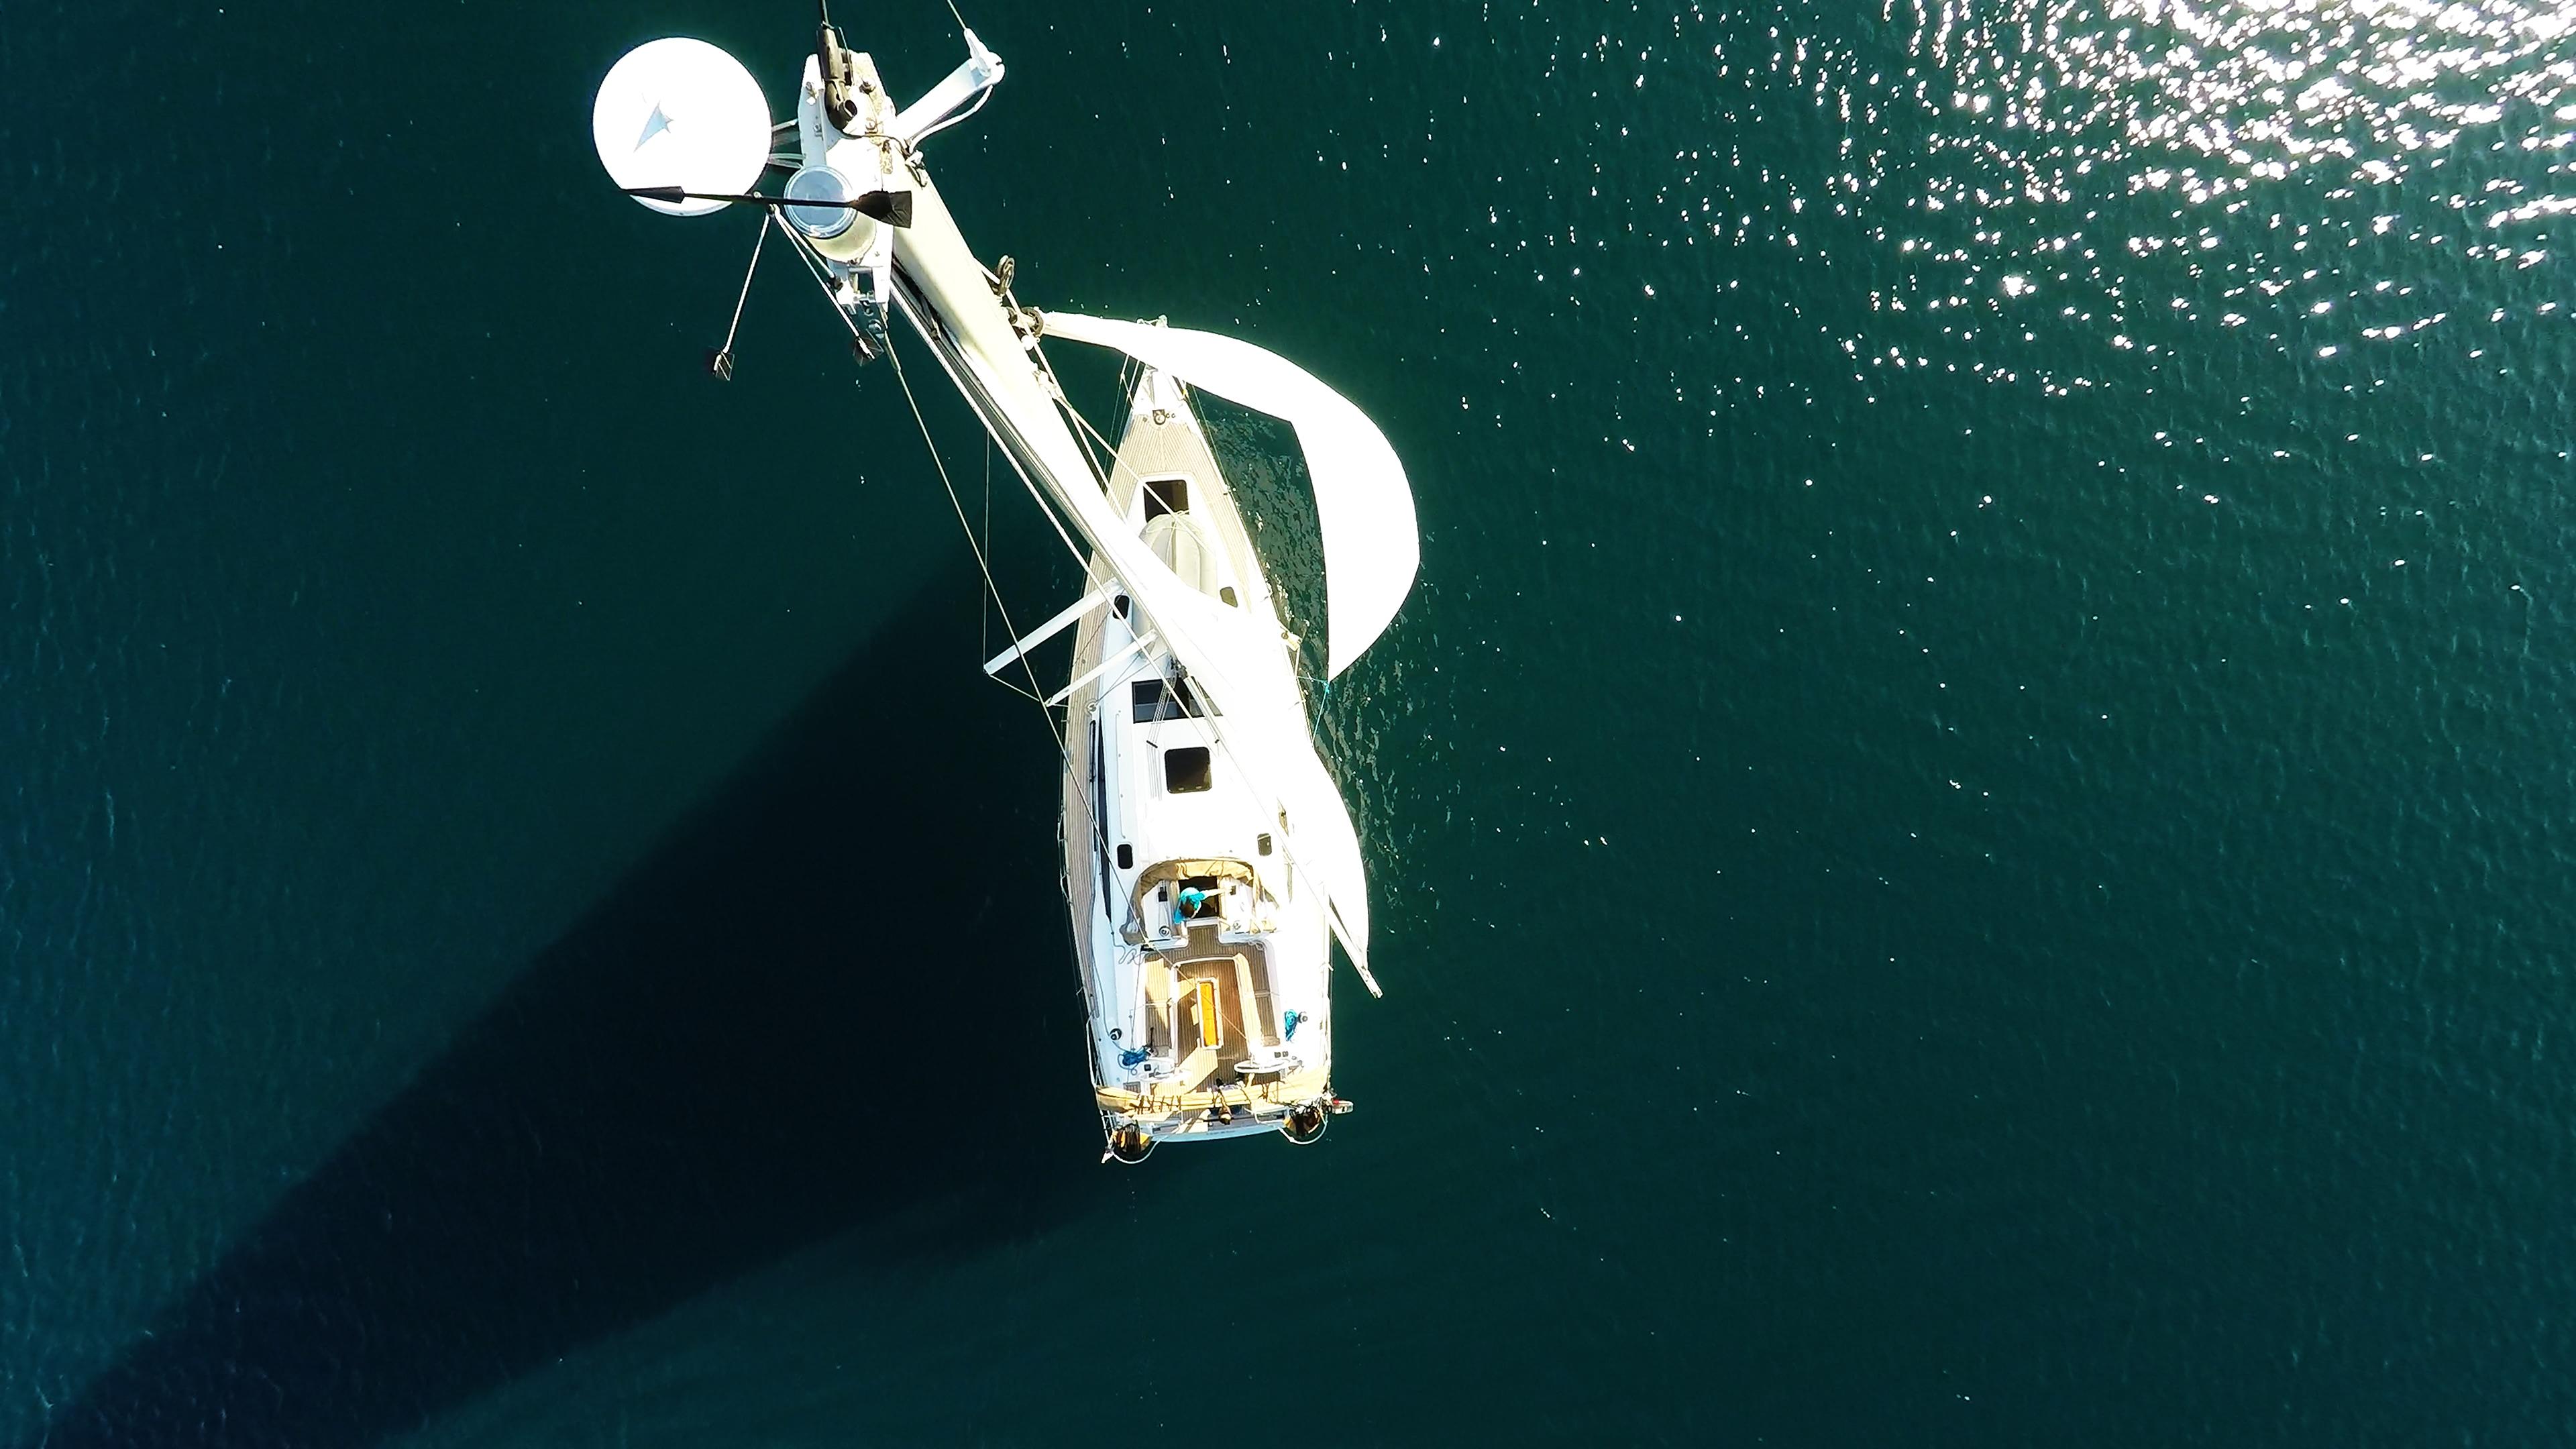 barcha a vela cima dell'albero radar yacht a vela elan 45 impression vele barca a vela